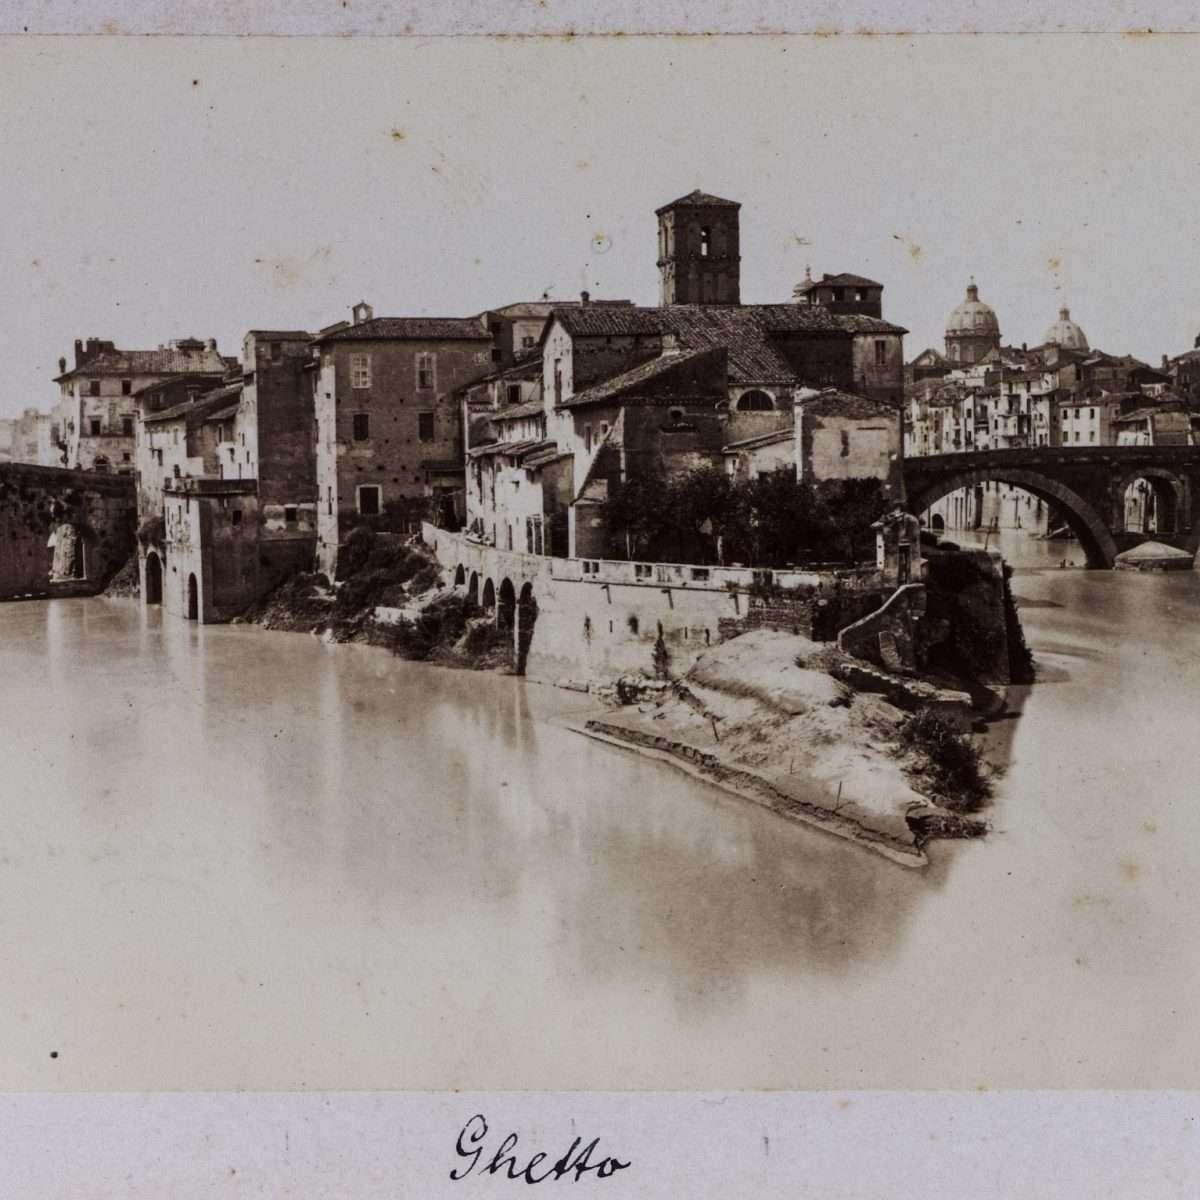 L-1090253 - Isola Tiberina